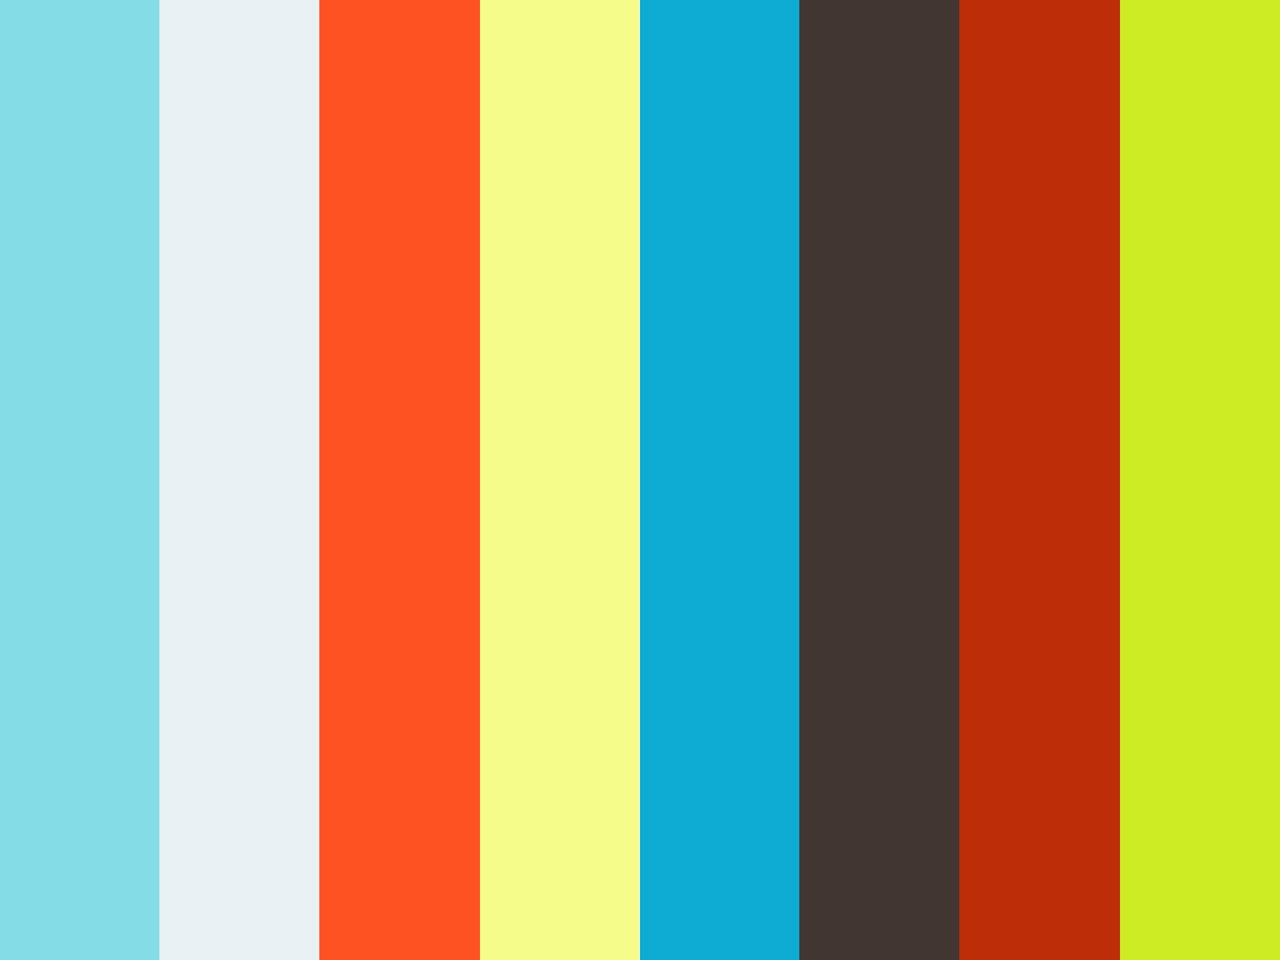 58127Scroll Bars Sensitivity analysis